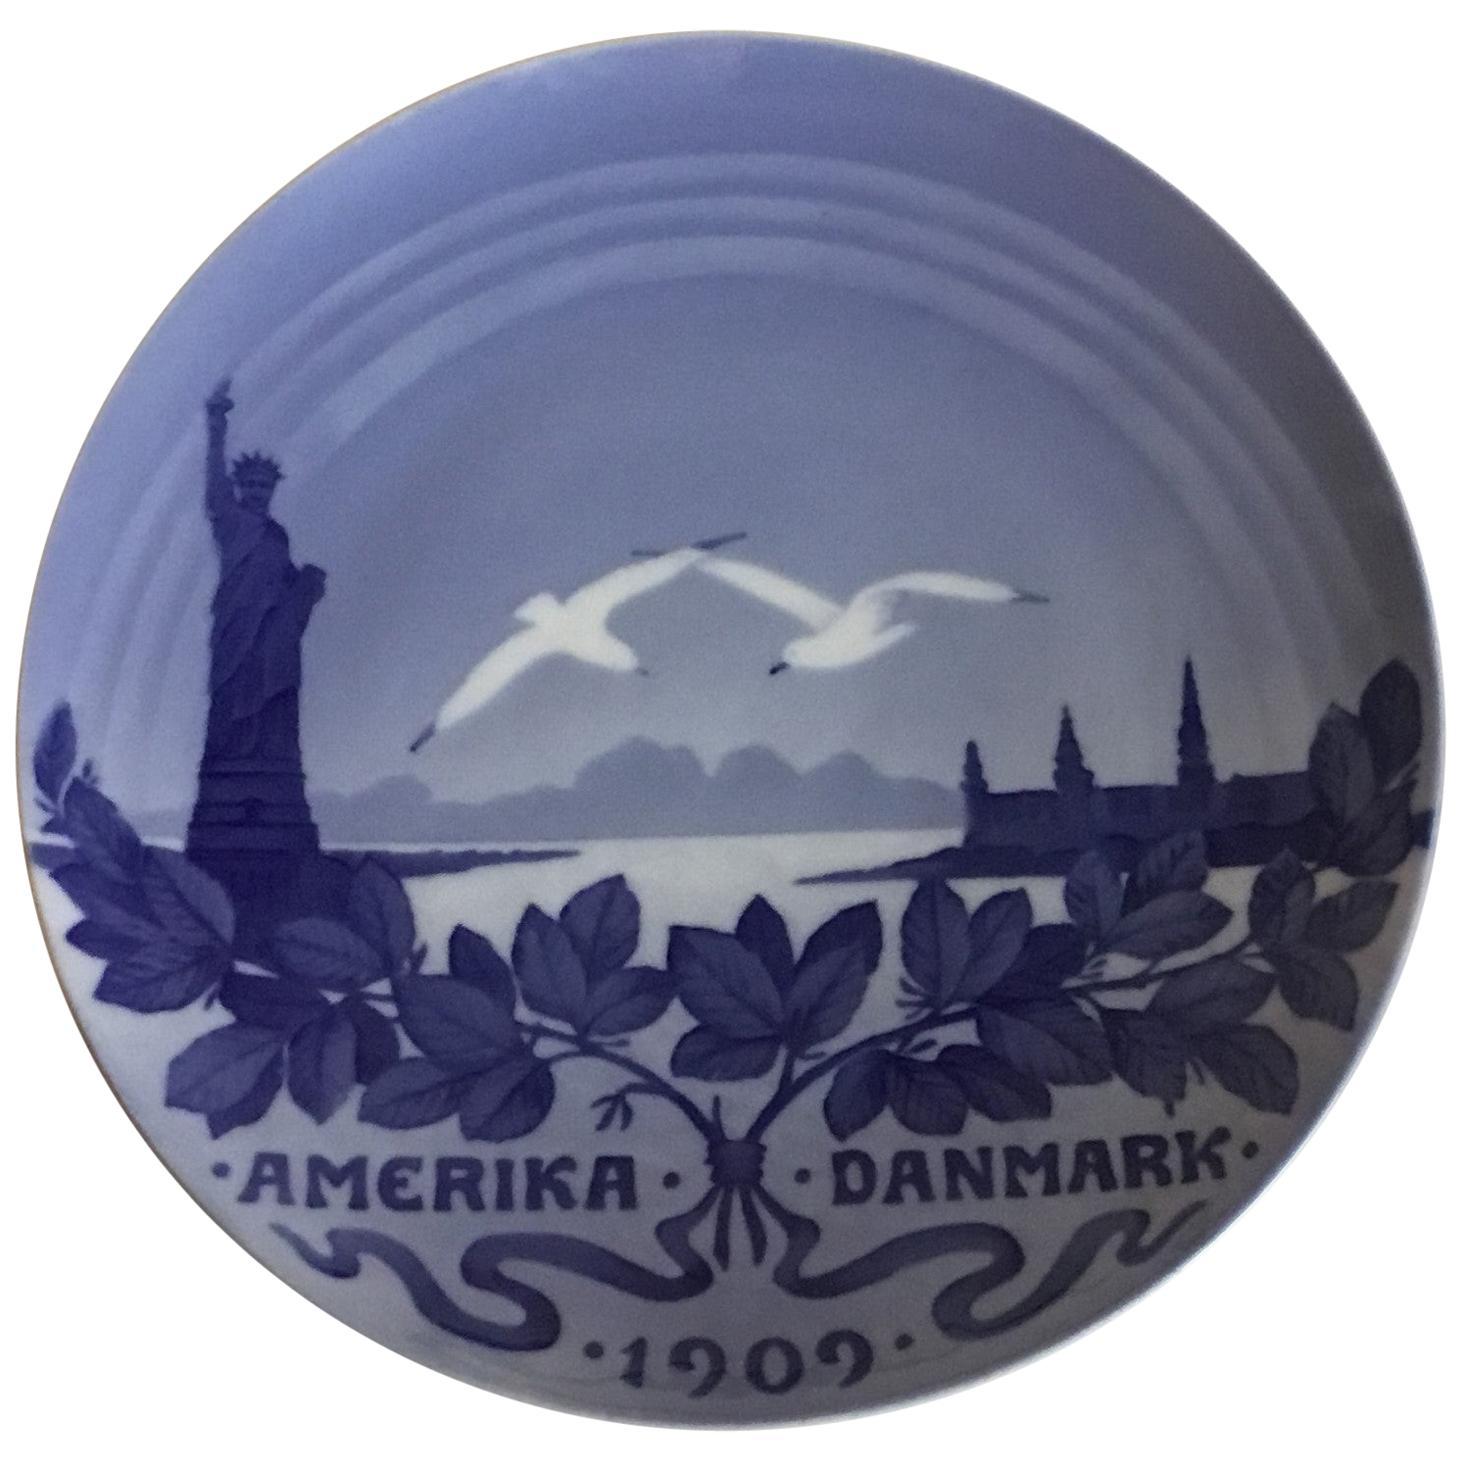 Royal Copenhagen Commemorative Plate from 1909 RC-CM1022